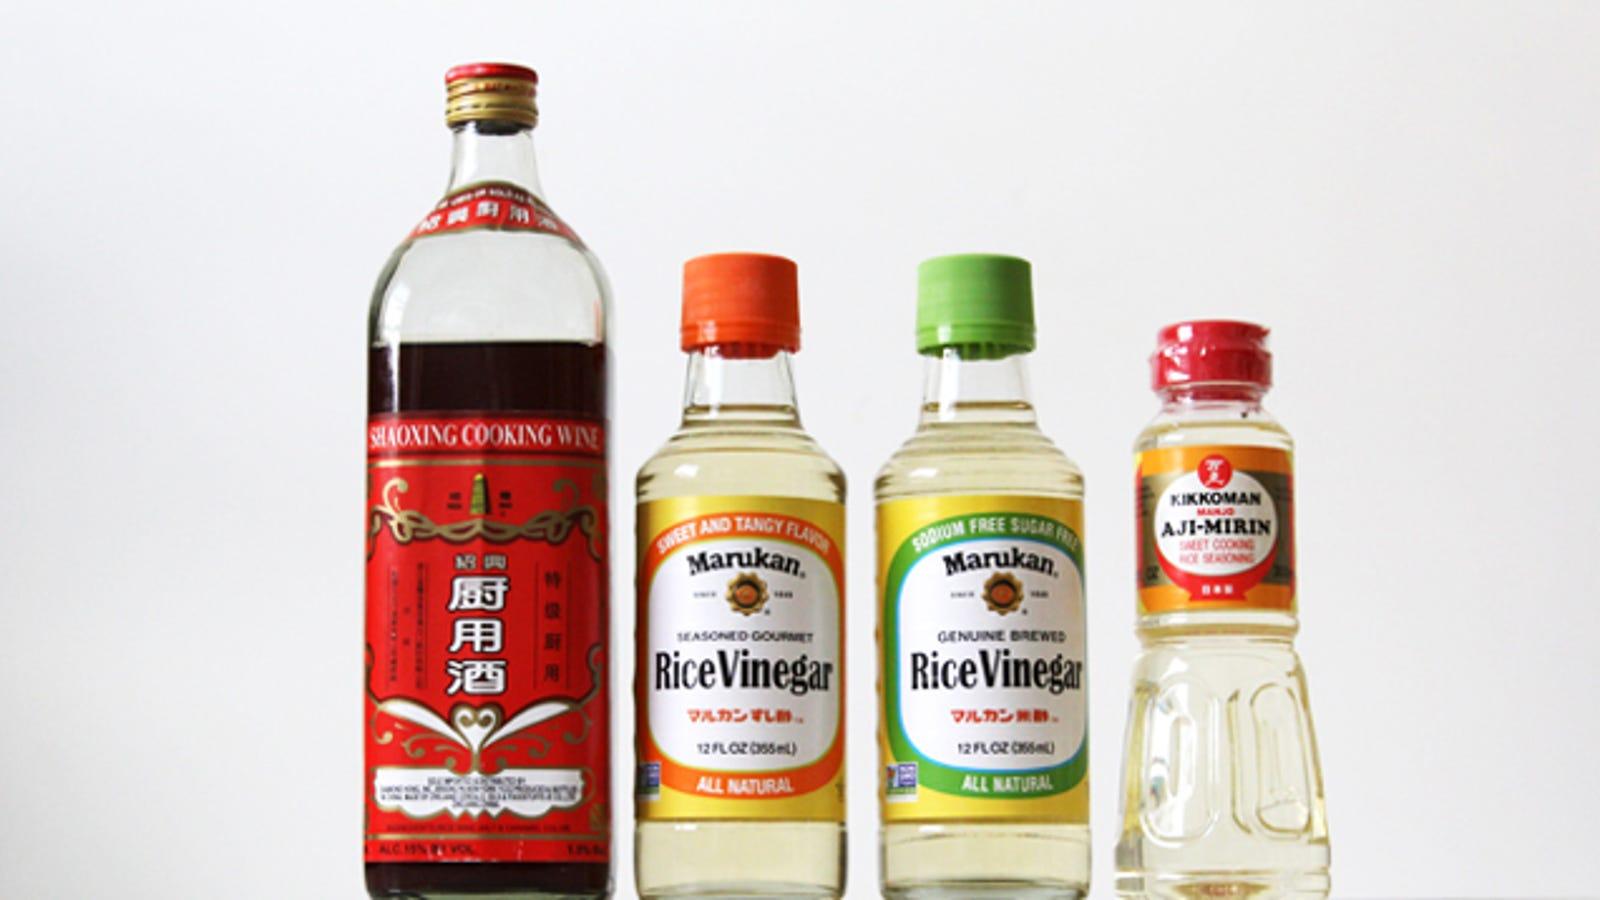 How To Make Rice Vinegar